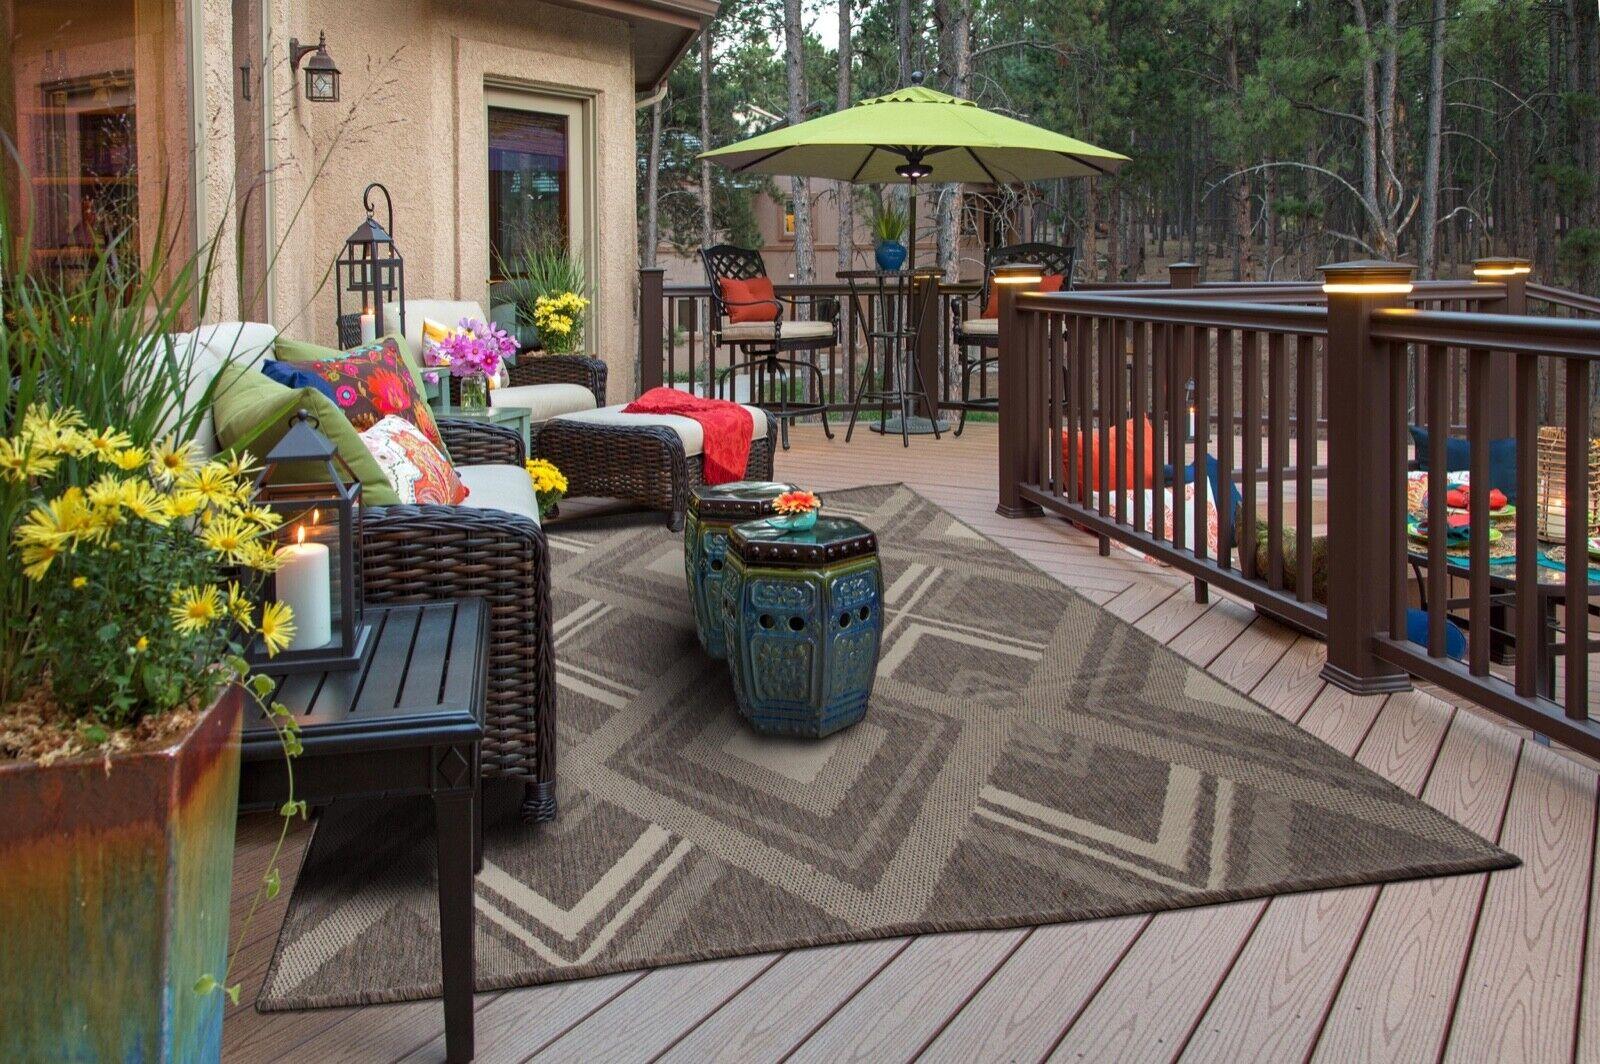 Weather-Proof canny#05 Gray Modern Indoor/Outdoor Area Rug s